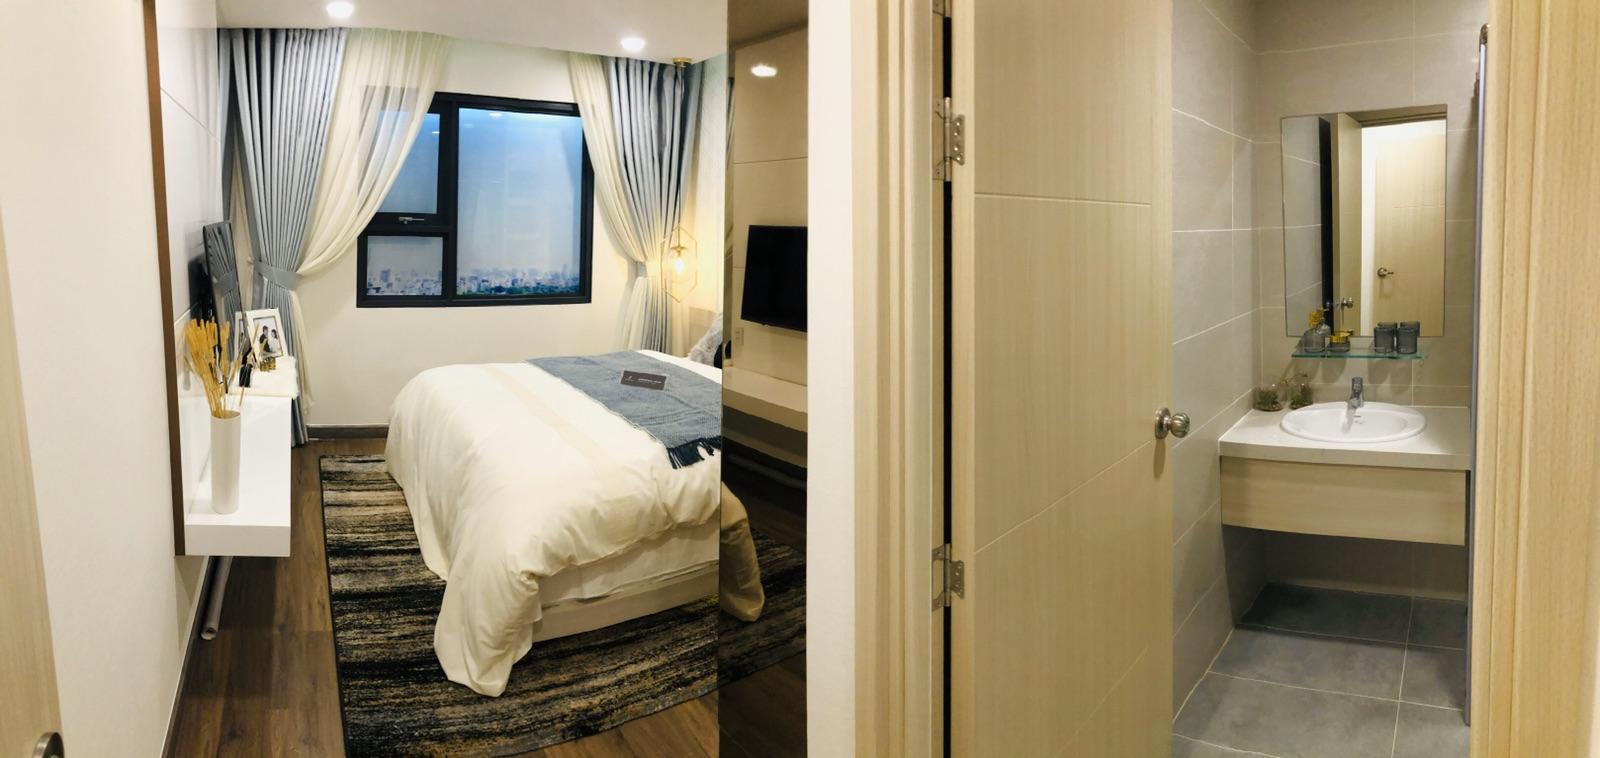 phòng ngủ căn hộ La Partenza